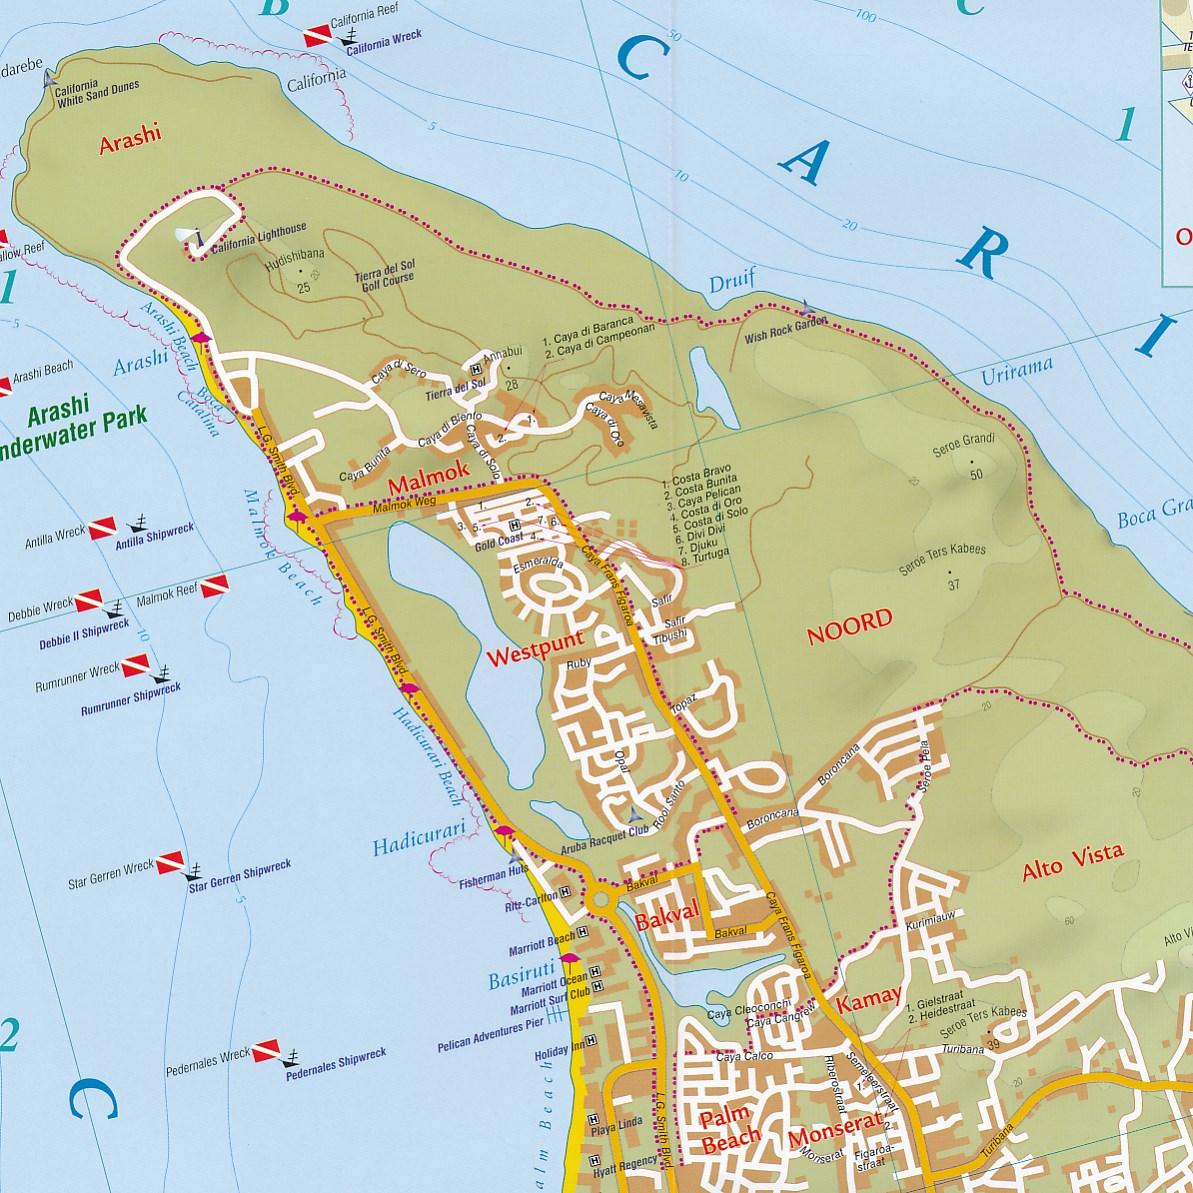 Wegenkaart Landkaart Aruba Kasprowski Maps 9791095793014